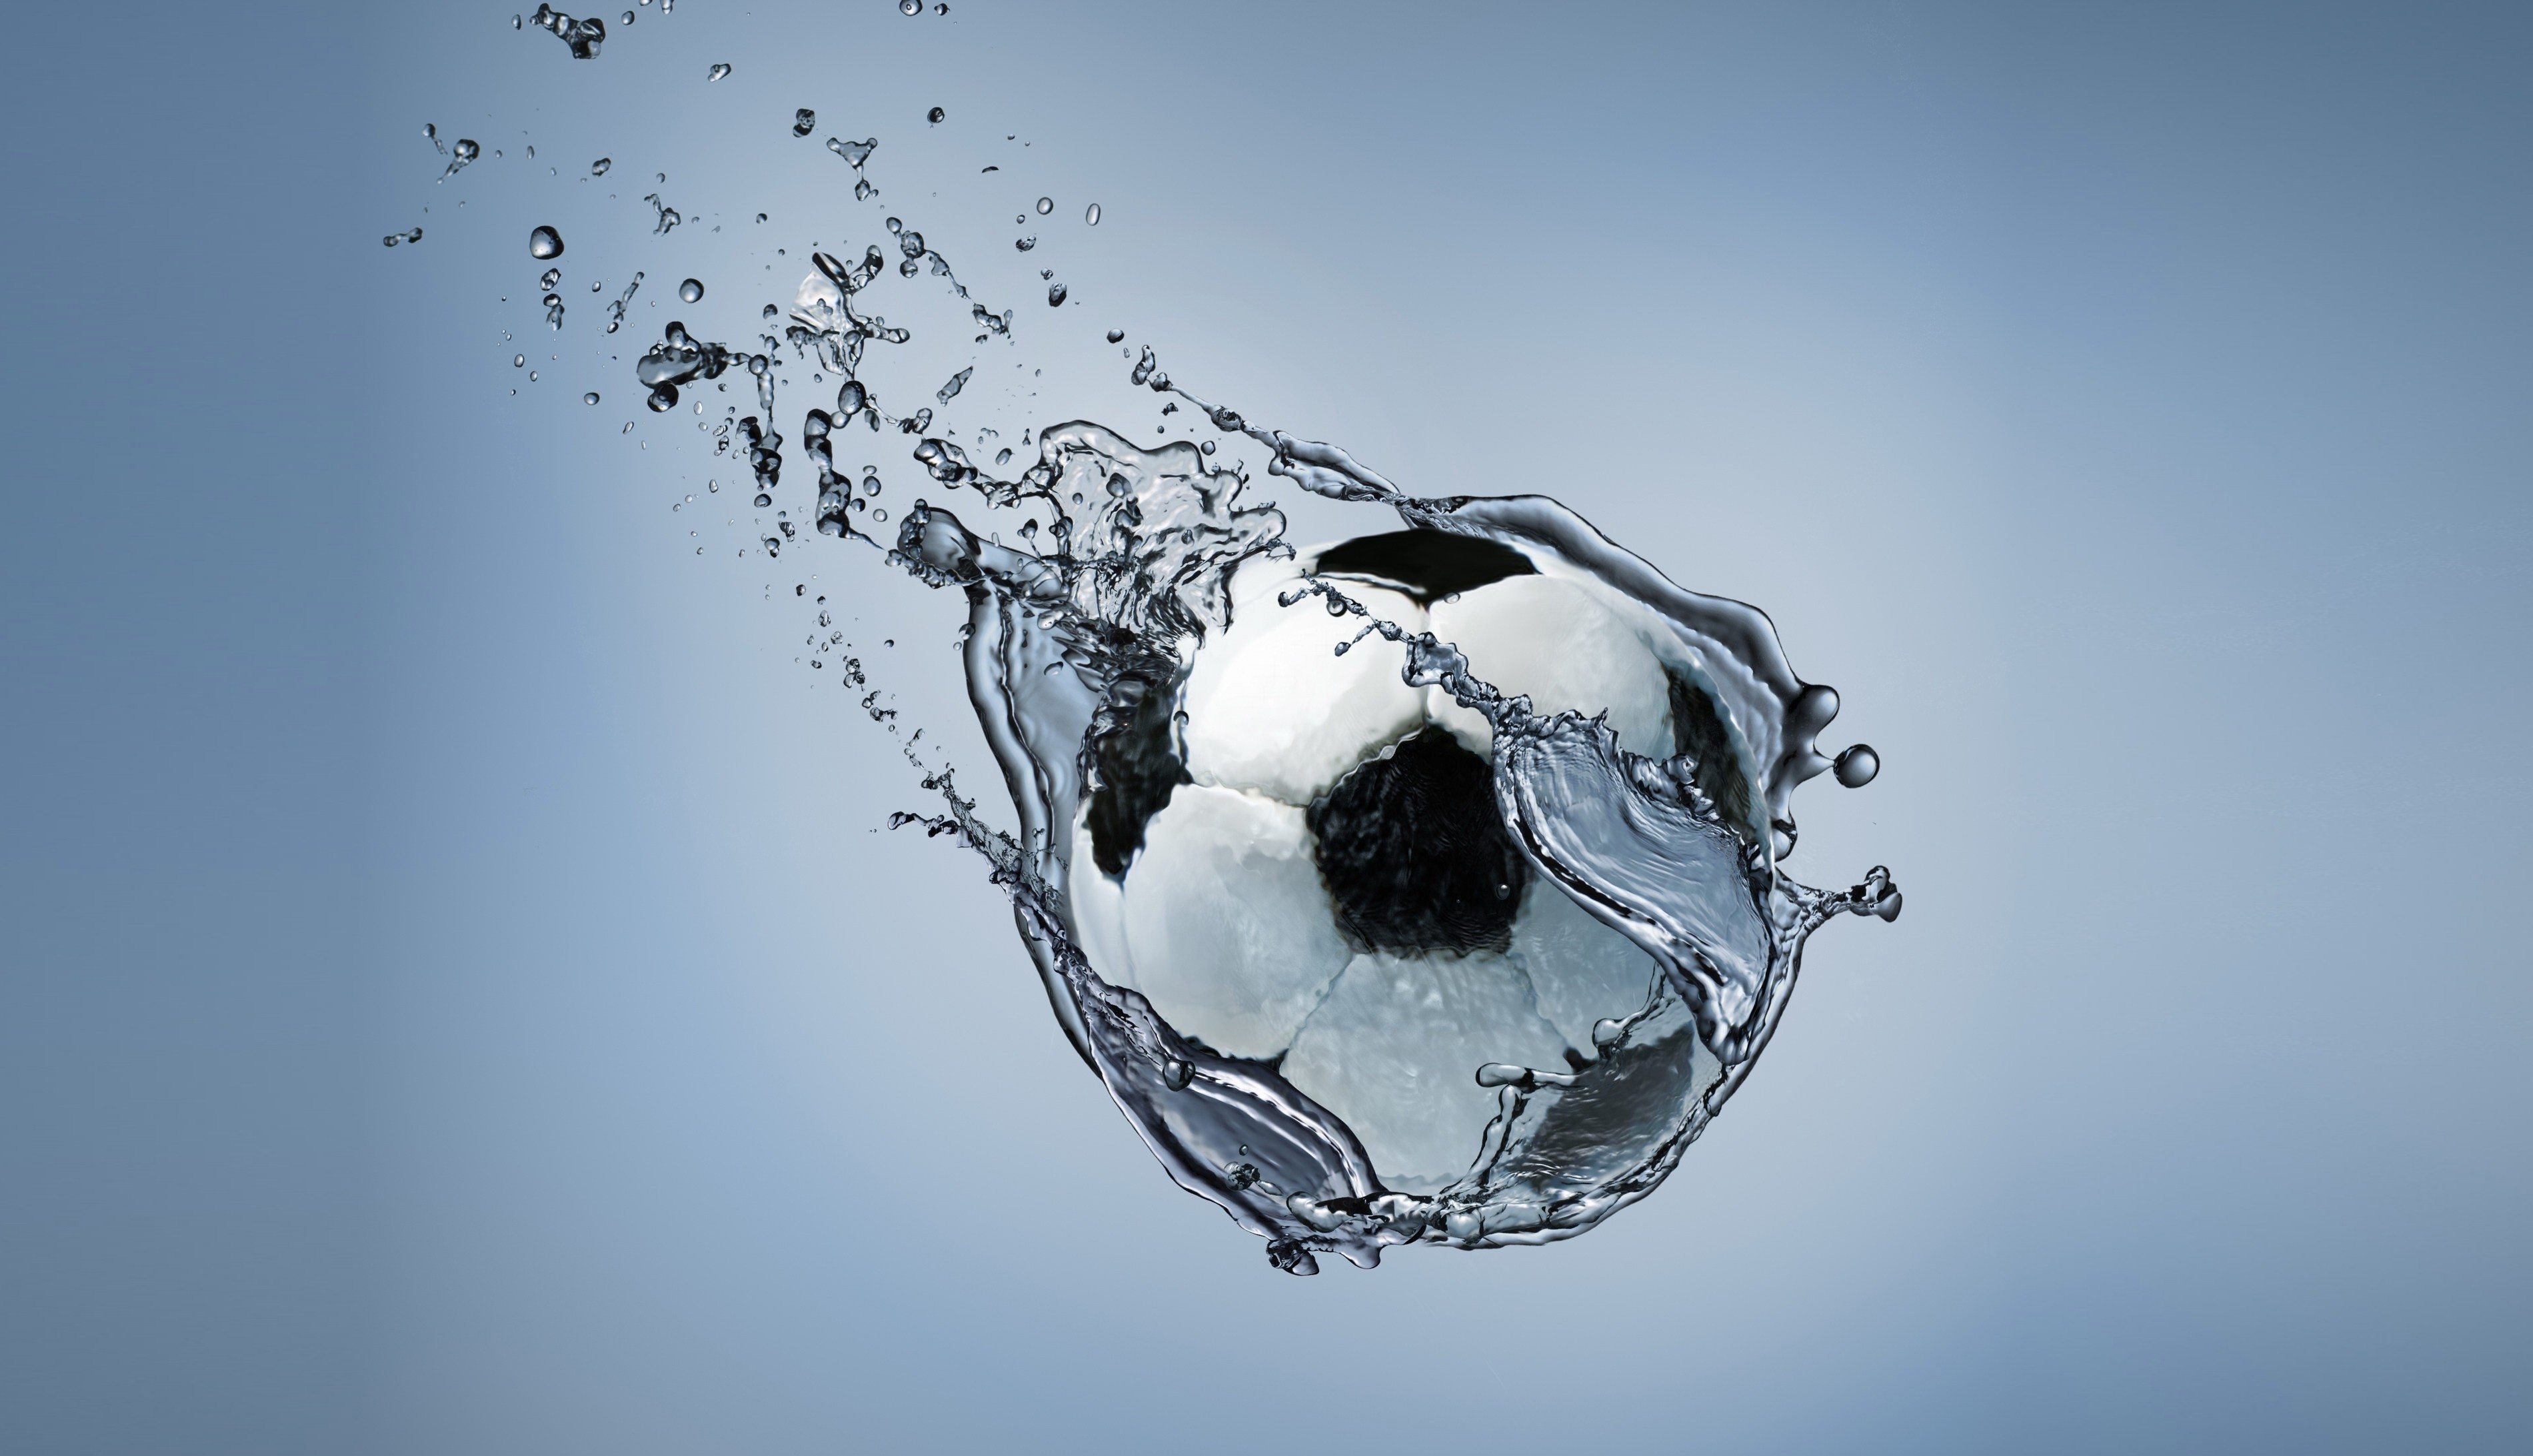 wallpaper ball football water splash sport 12721